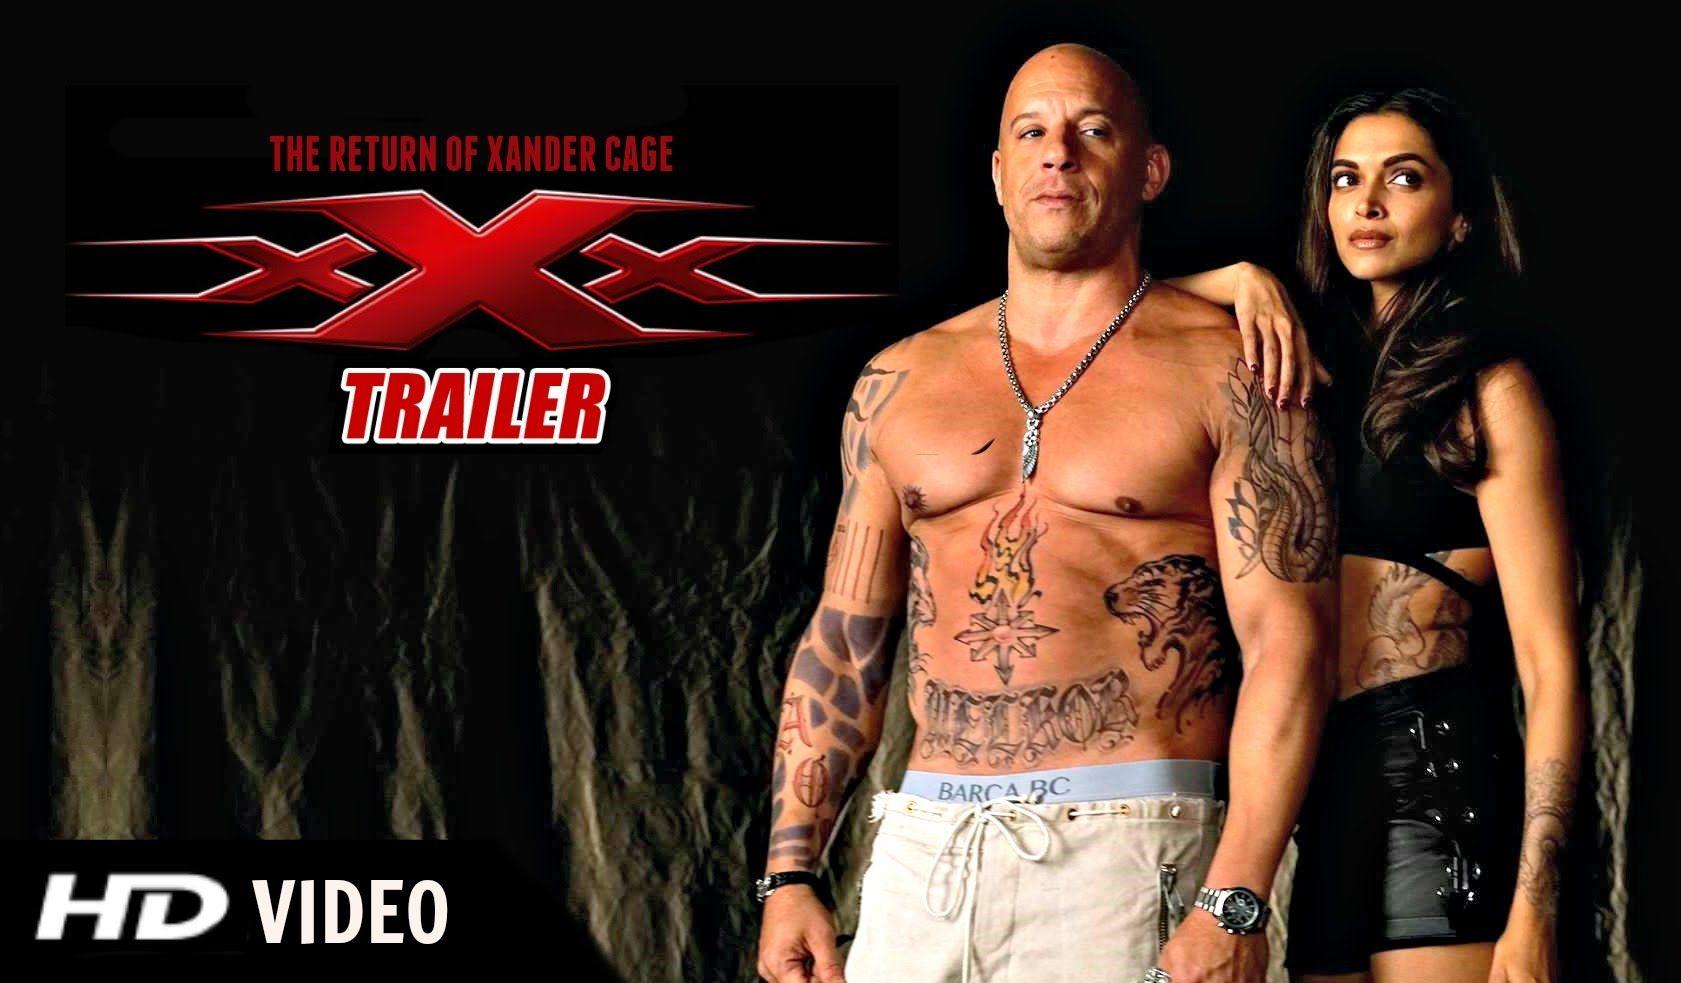 Free Xxx Hd Downloads intended for xxx: return of xander cage hd movie torrent download | xxx: return